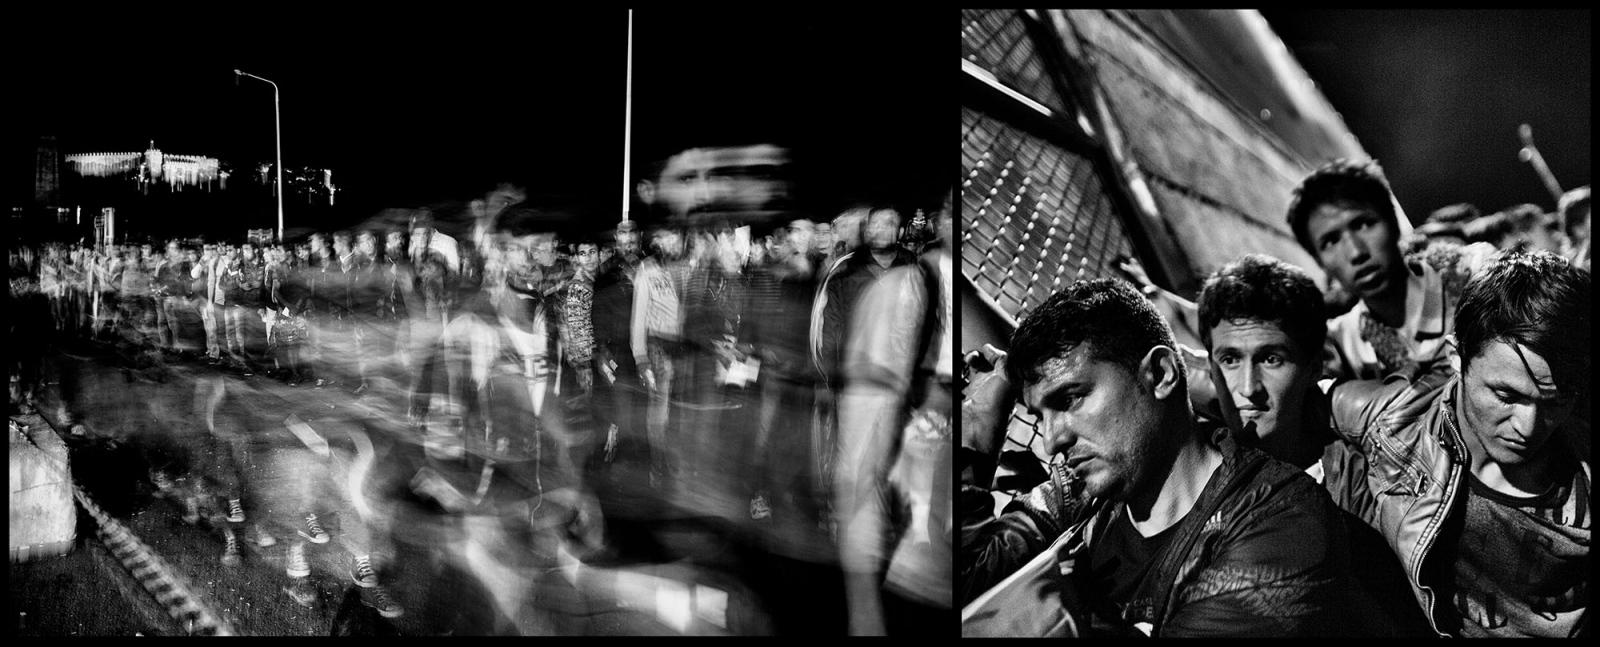 Art and Documentary Photography - Loading Nikos_Pilos_Stern_Goethe_institute_008.jpg